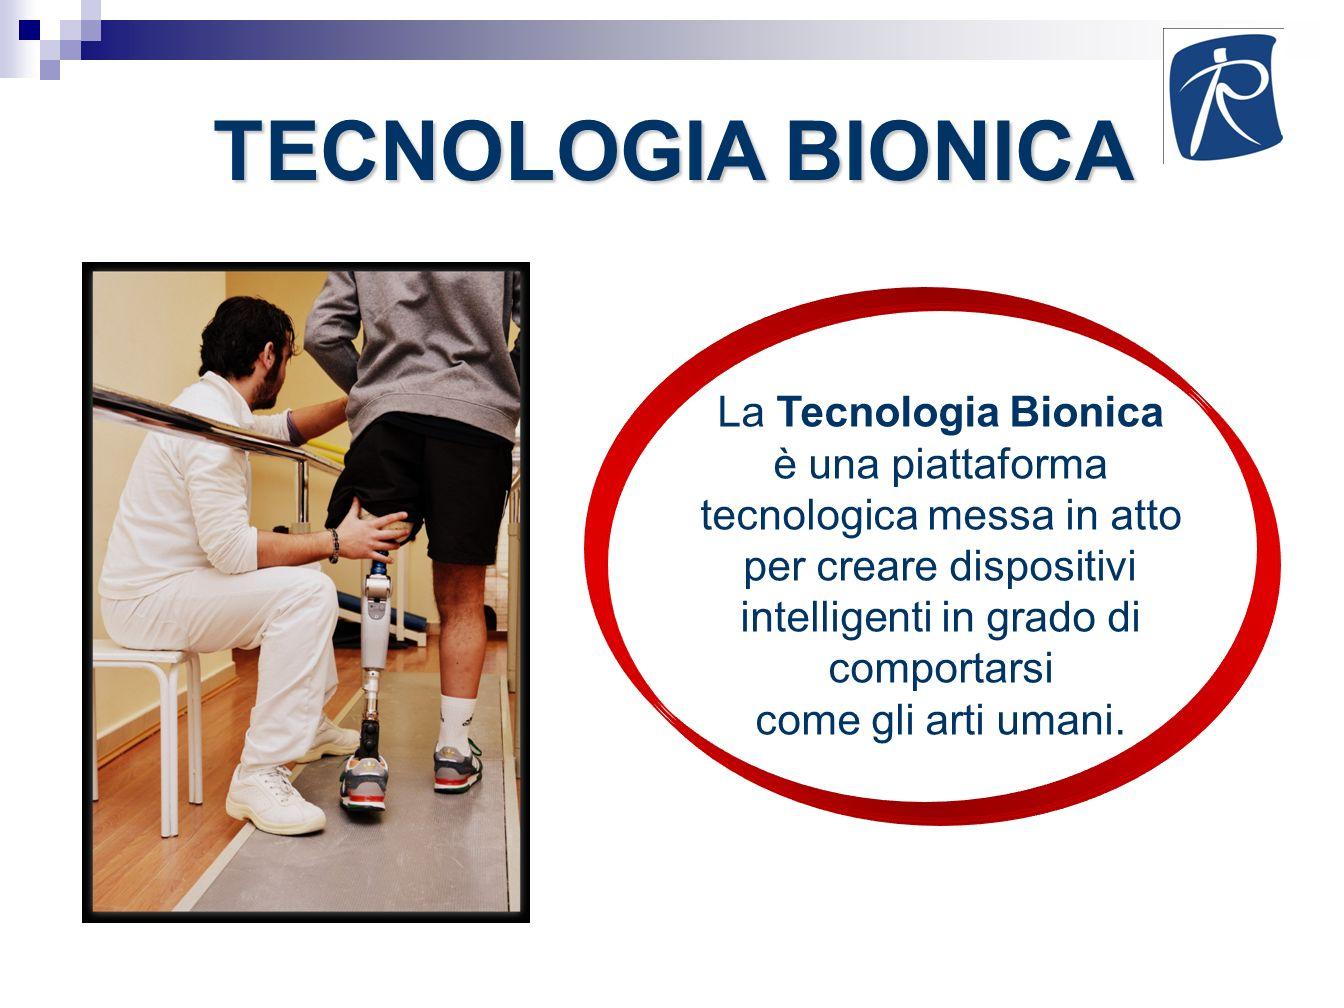 TECNOLOGIA BIONICA La Tecnologia Bionica è una piattaforma